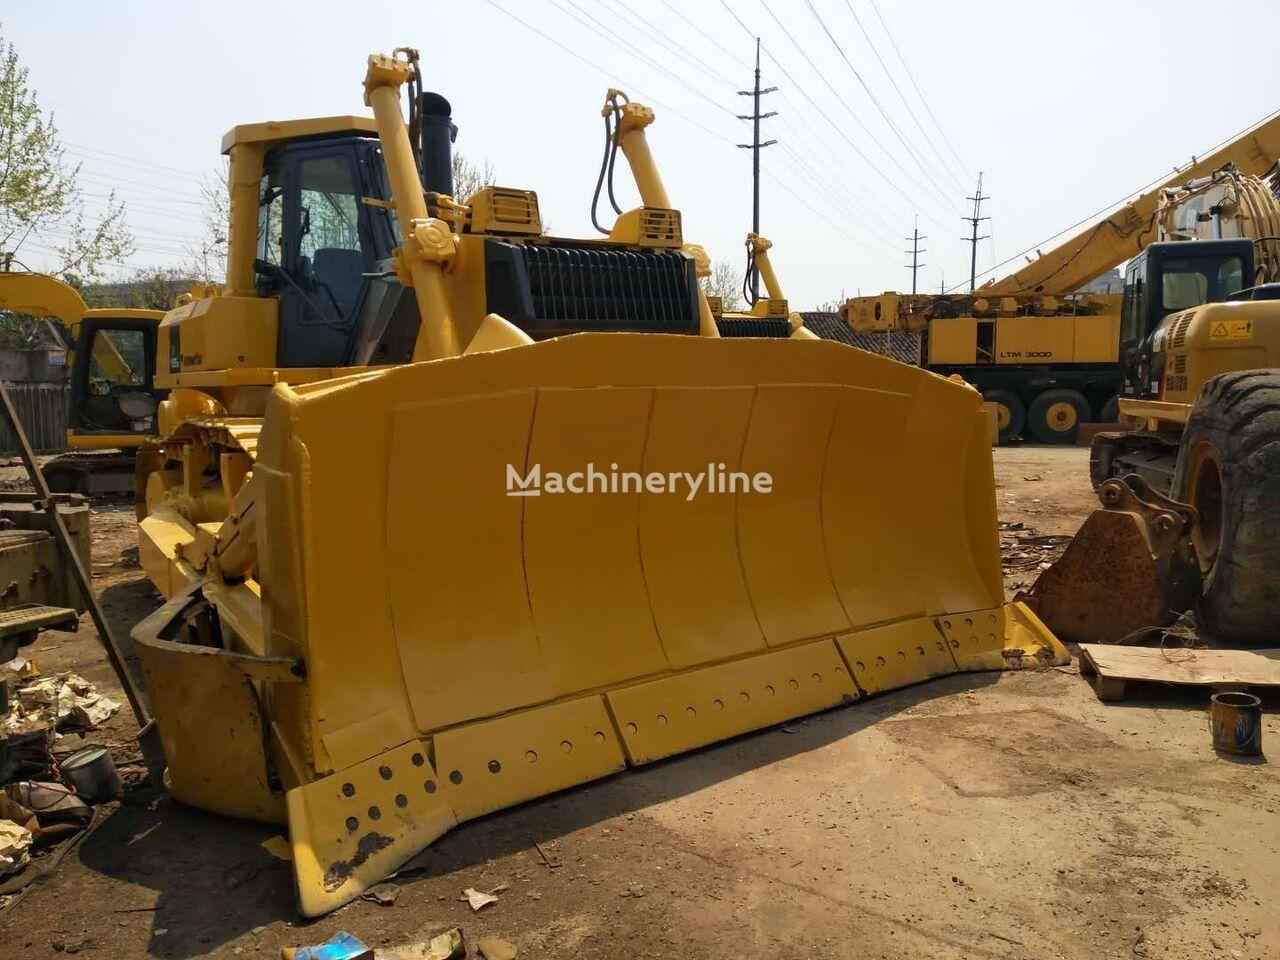 CATERPILLAR D155A  bulldozer